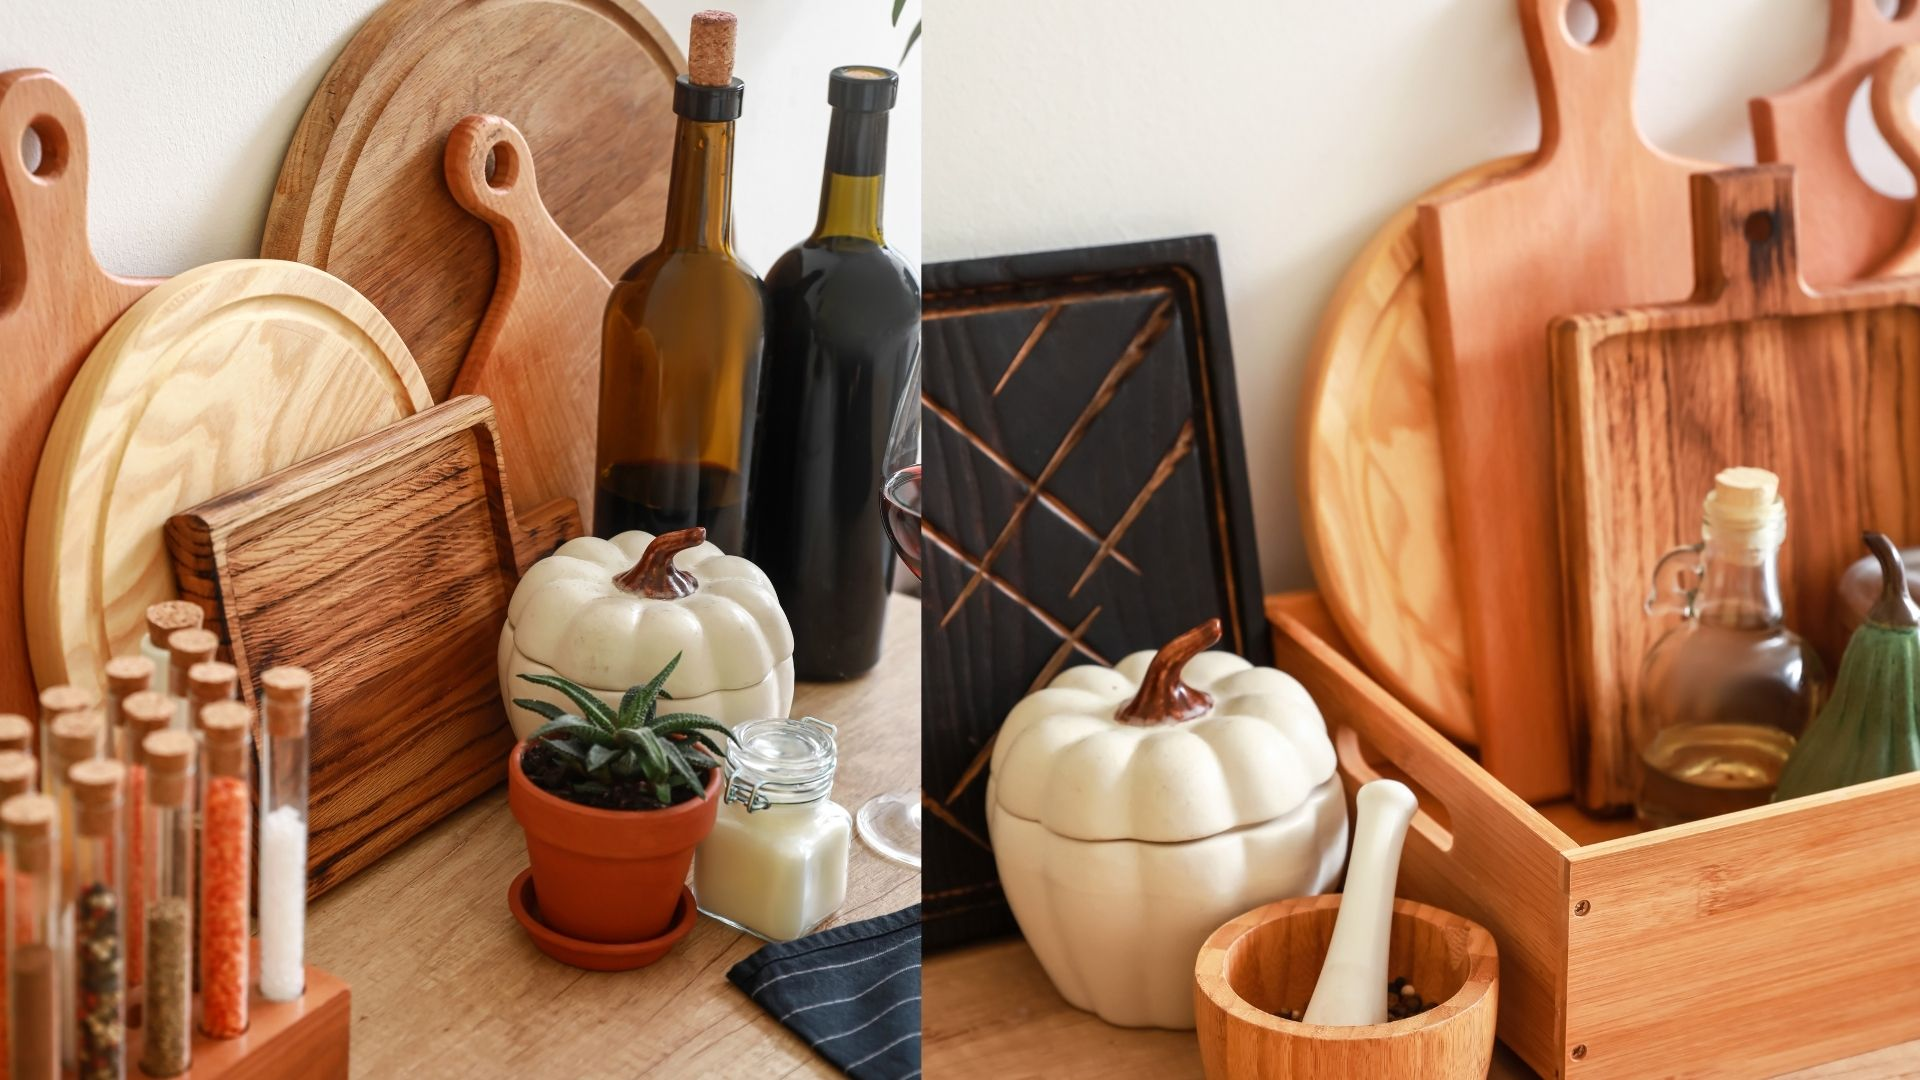 deski drewniane kuchenne